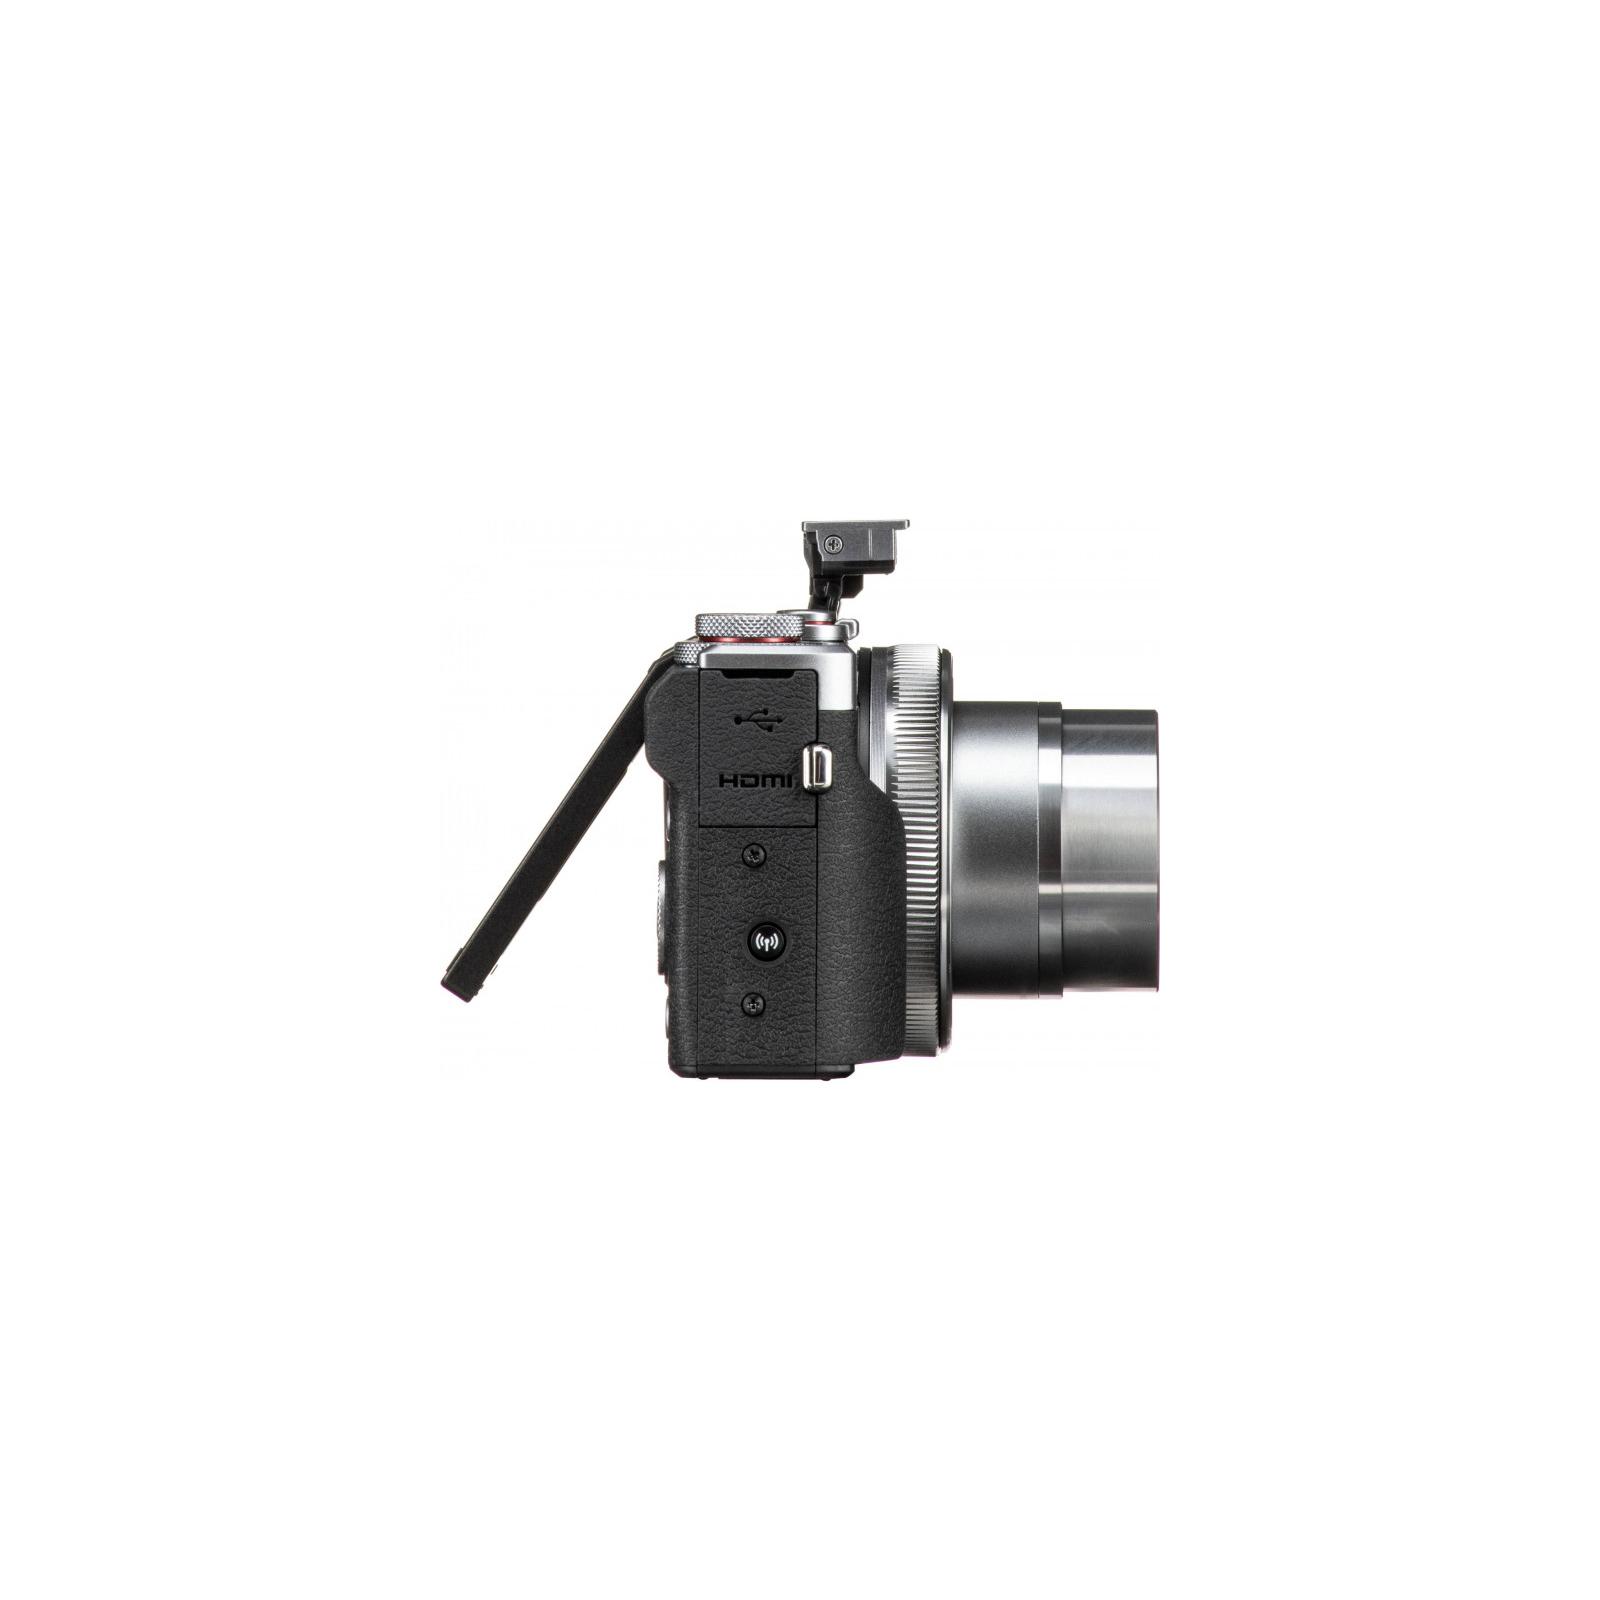 Цифровой фотоаппарат Canon Powershot G7 X Mark III Black (3637C013) изображение 12